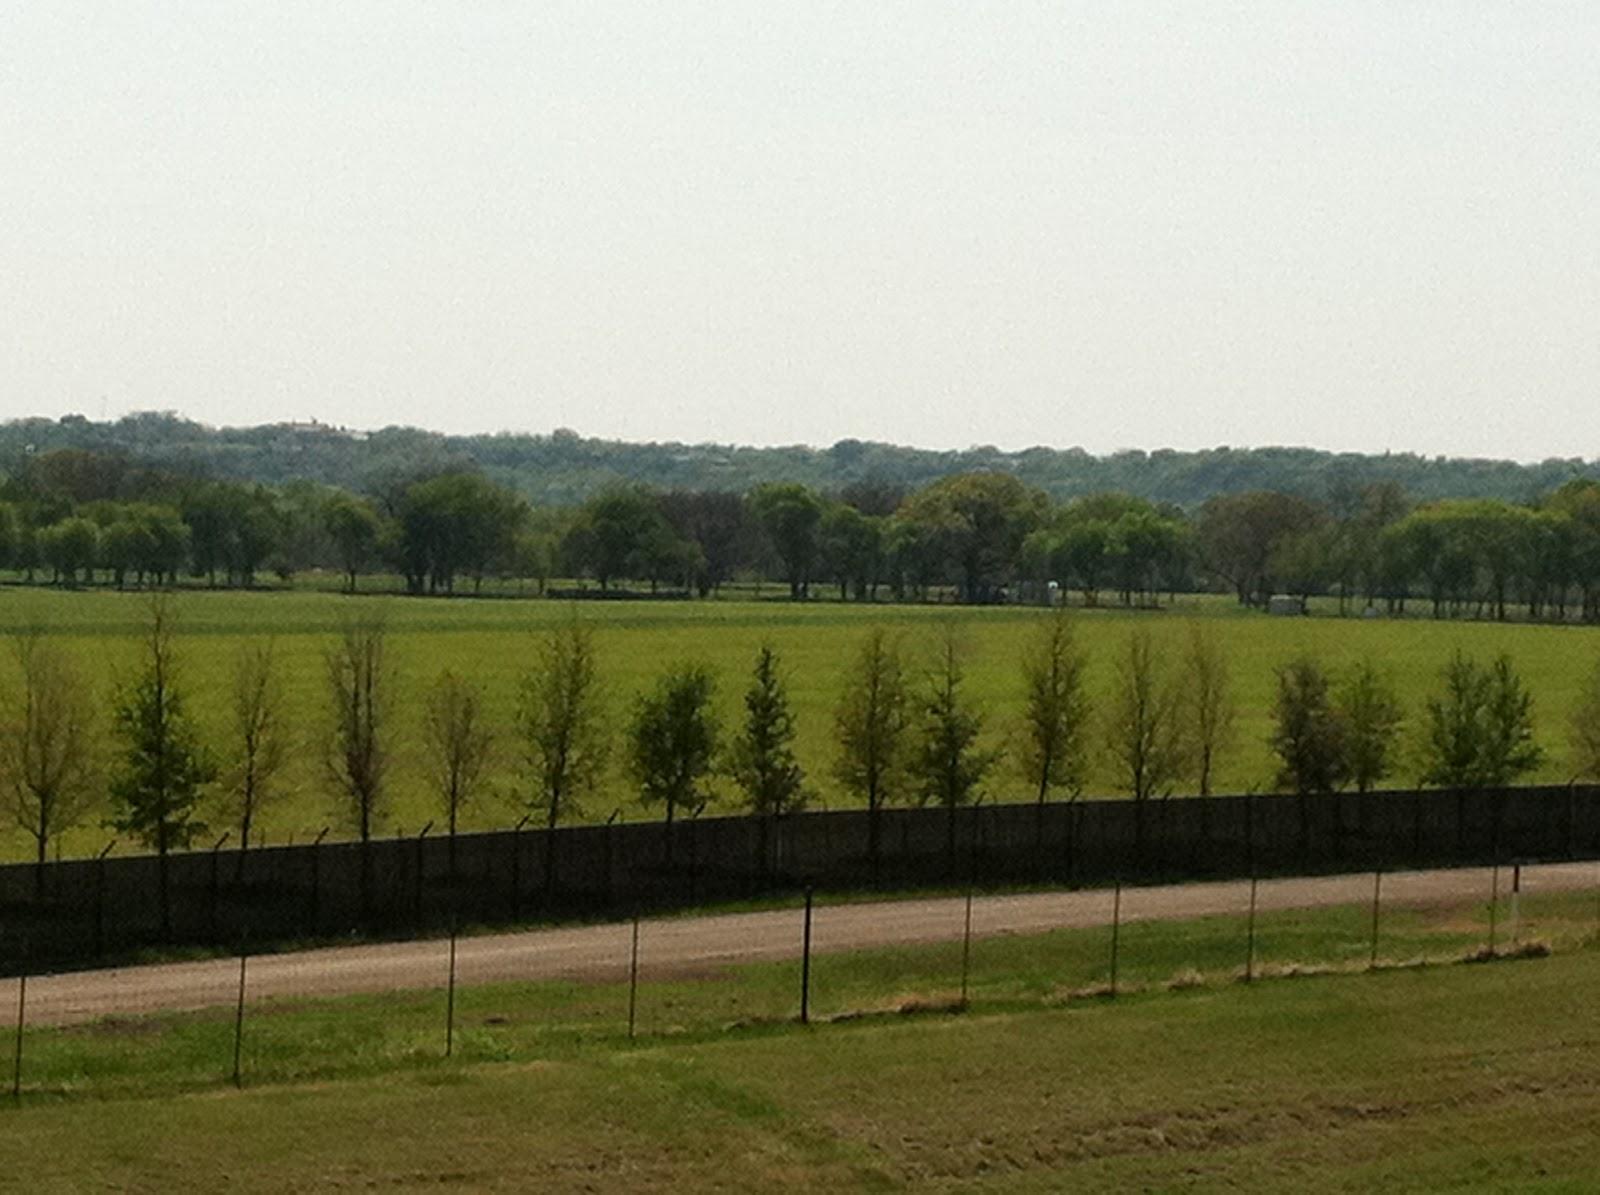 Fort Worth's Backyard